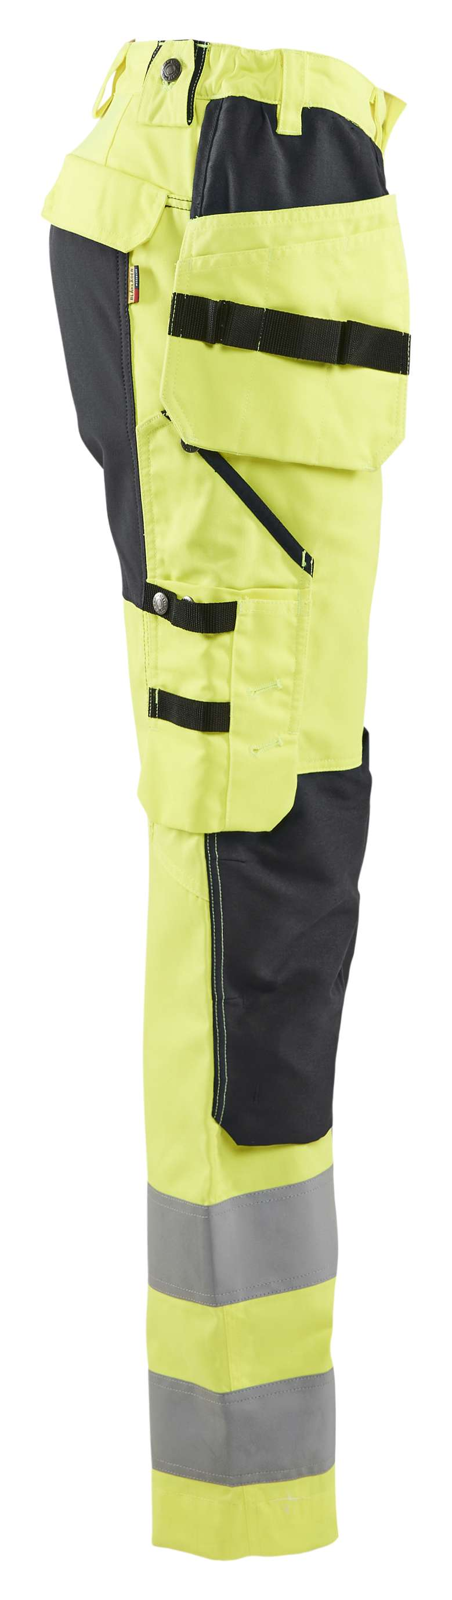 Blaklader Dames werkbroeken 71631811 High Vis fluo geel-zwart(3399)